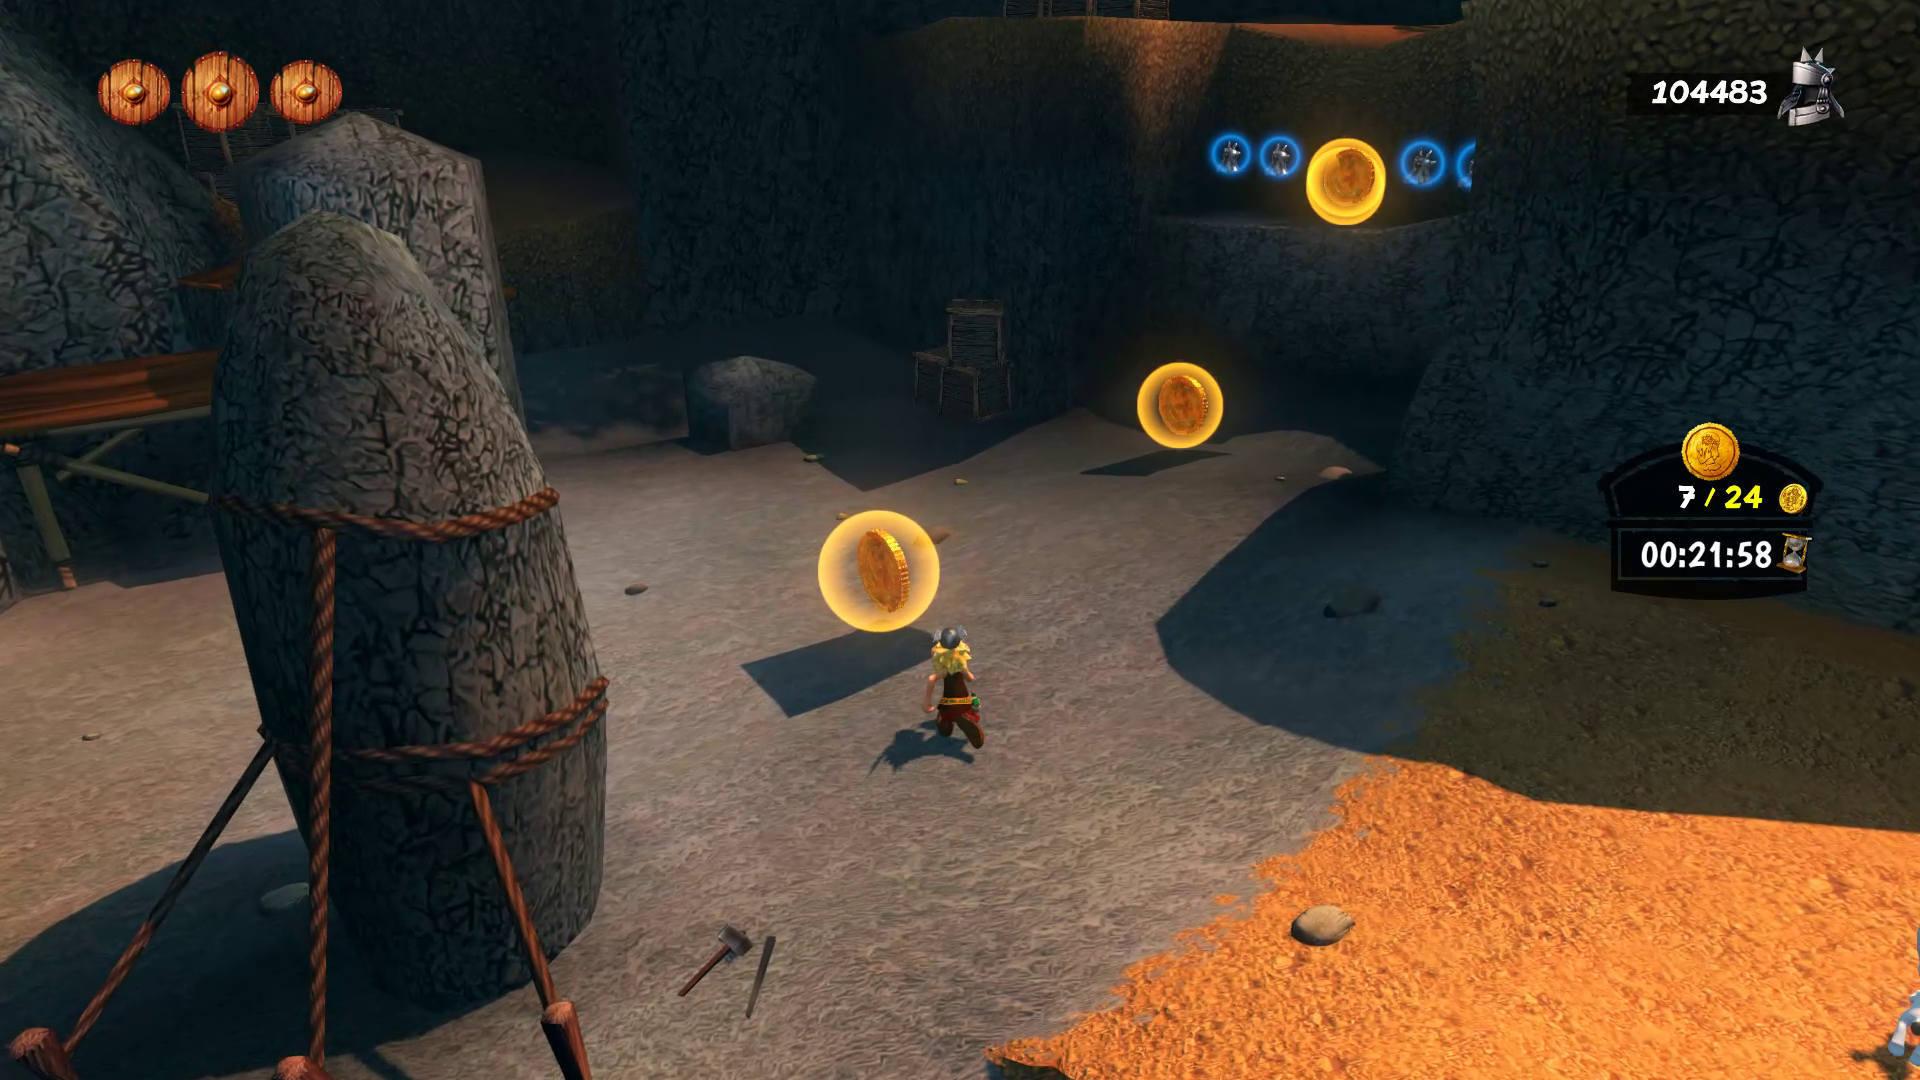 asterix-and-obelix-xxl-romastered-pc-screenshot-03